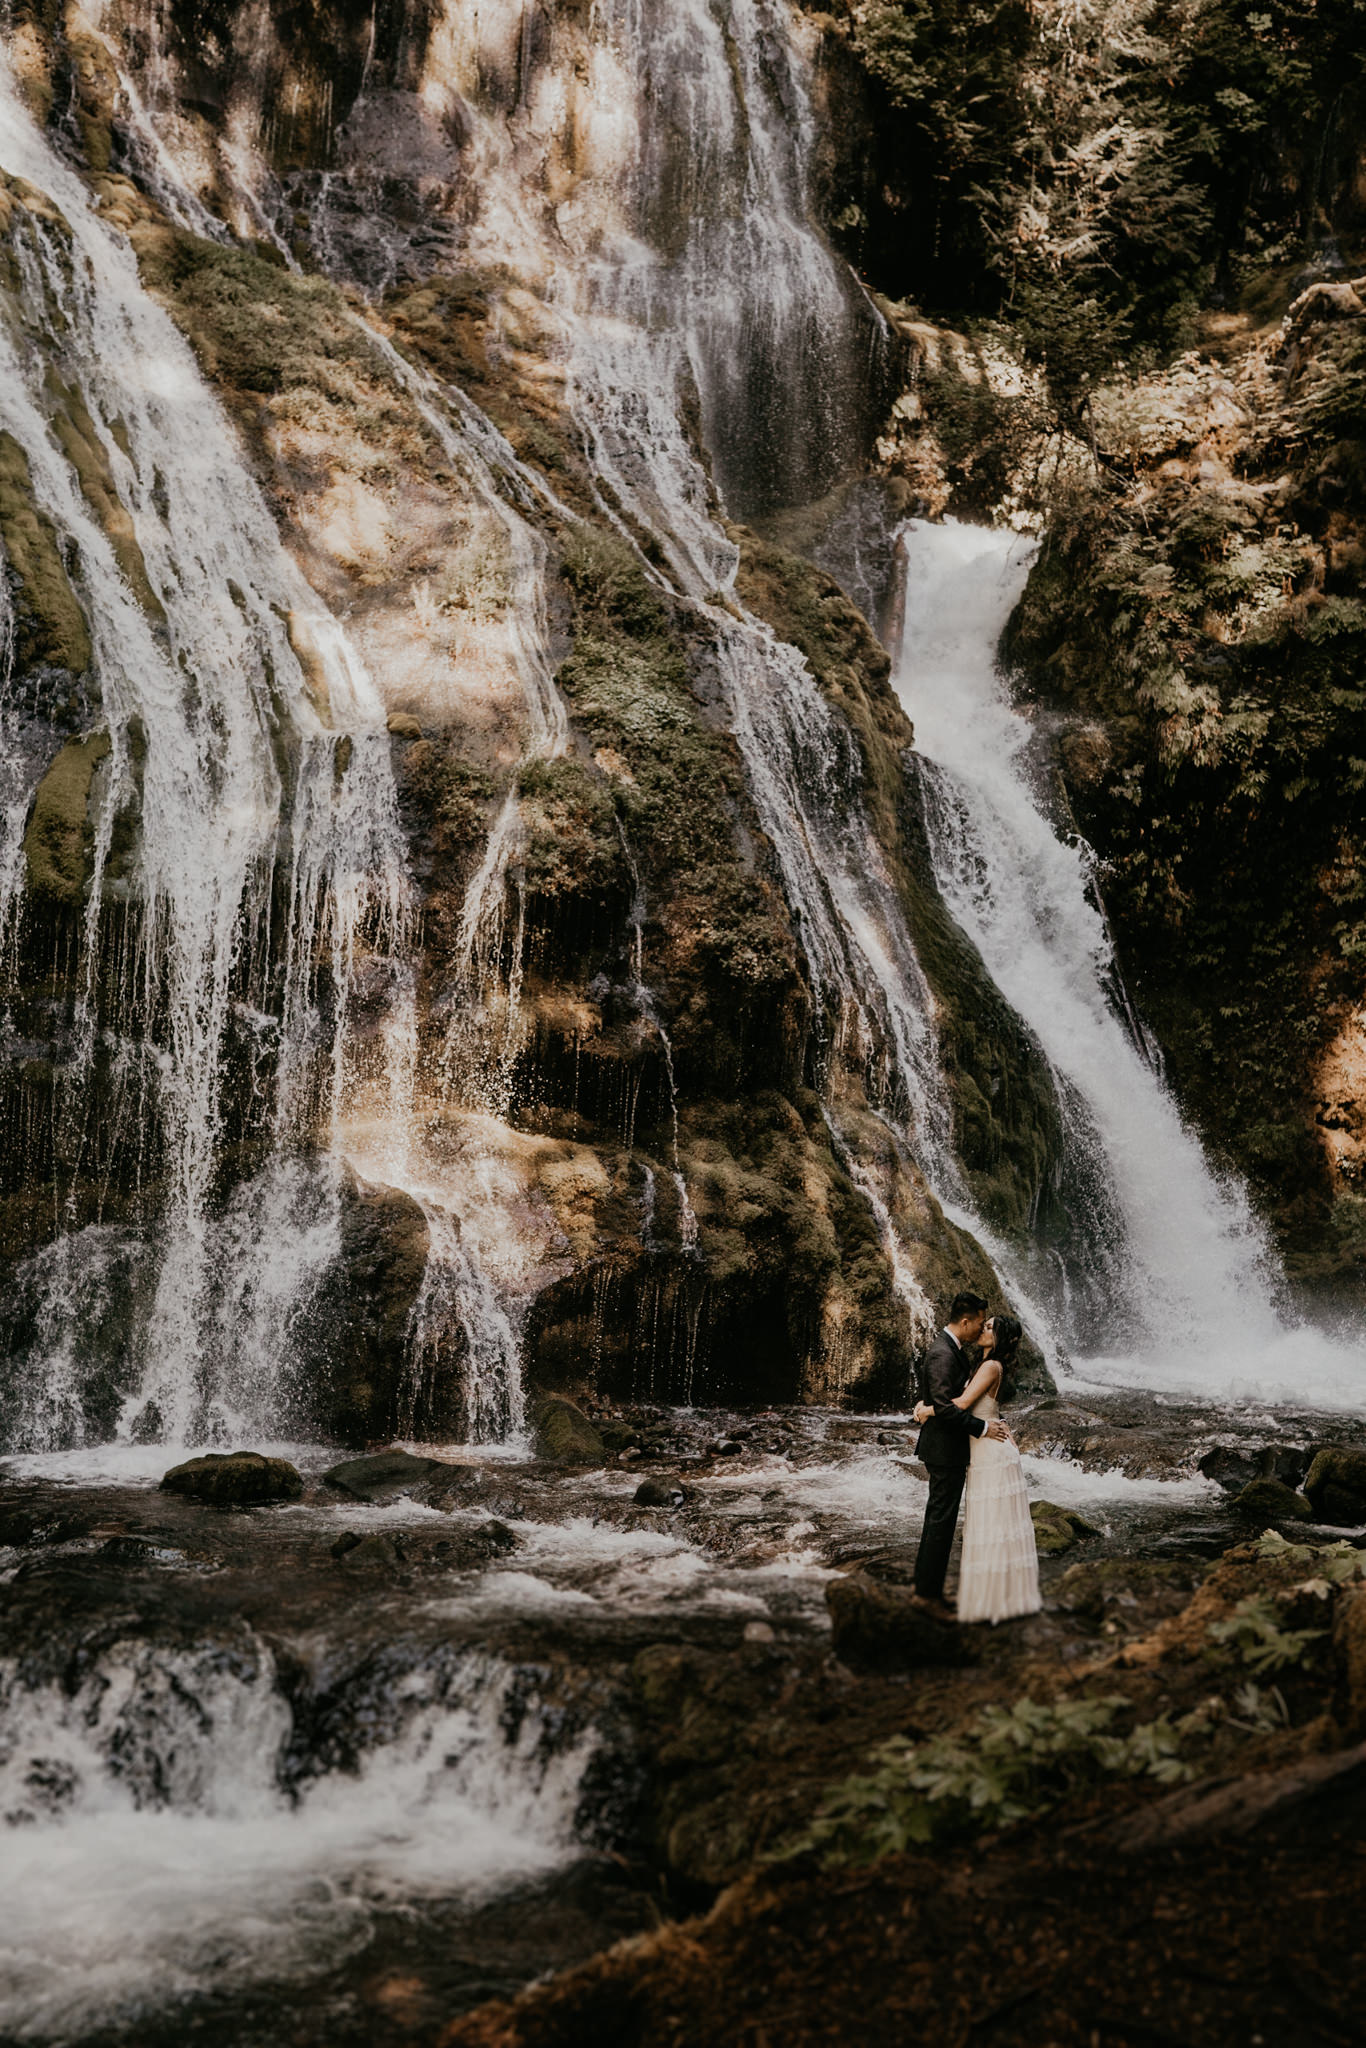 Gifford Pinchot adventure elopement by panther creek waterfalls